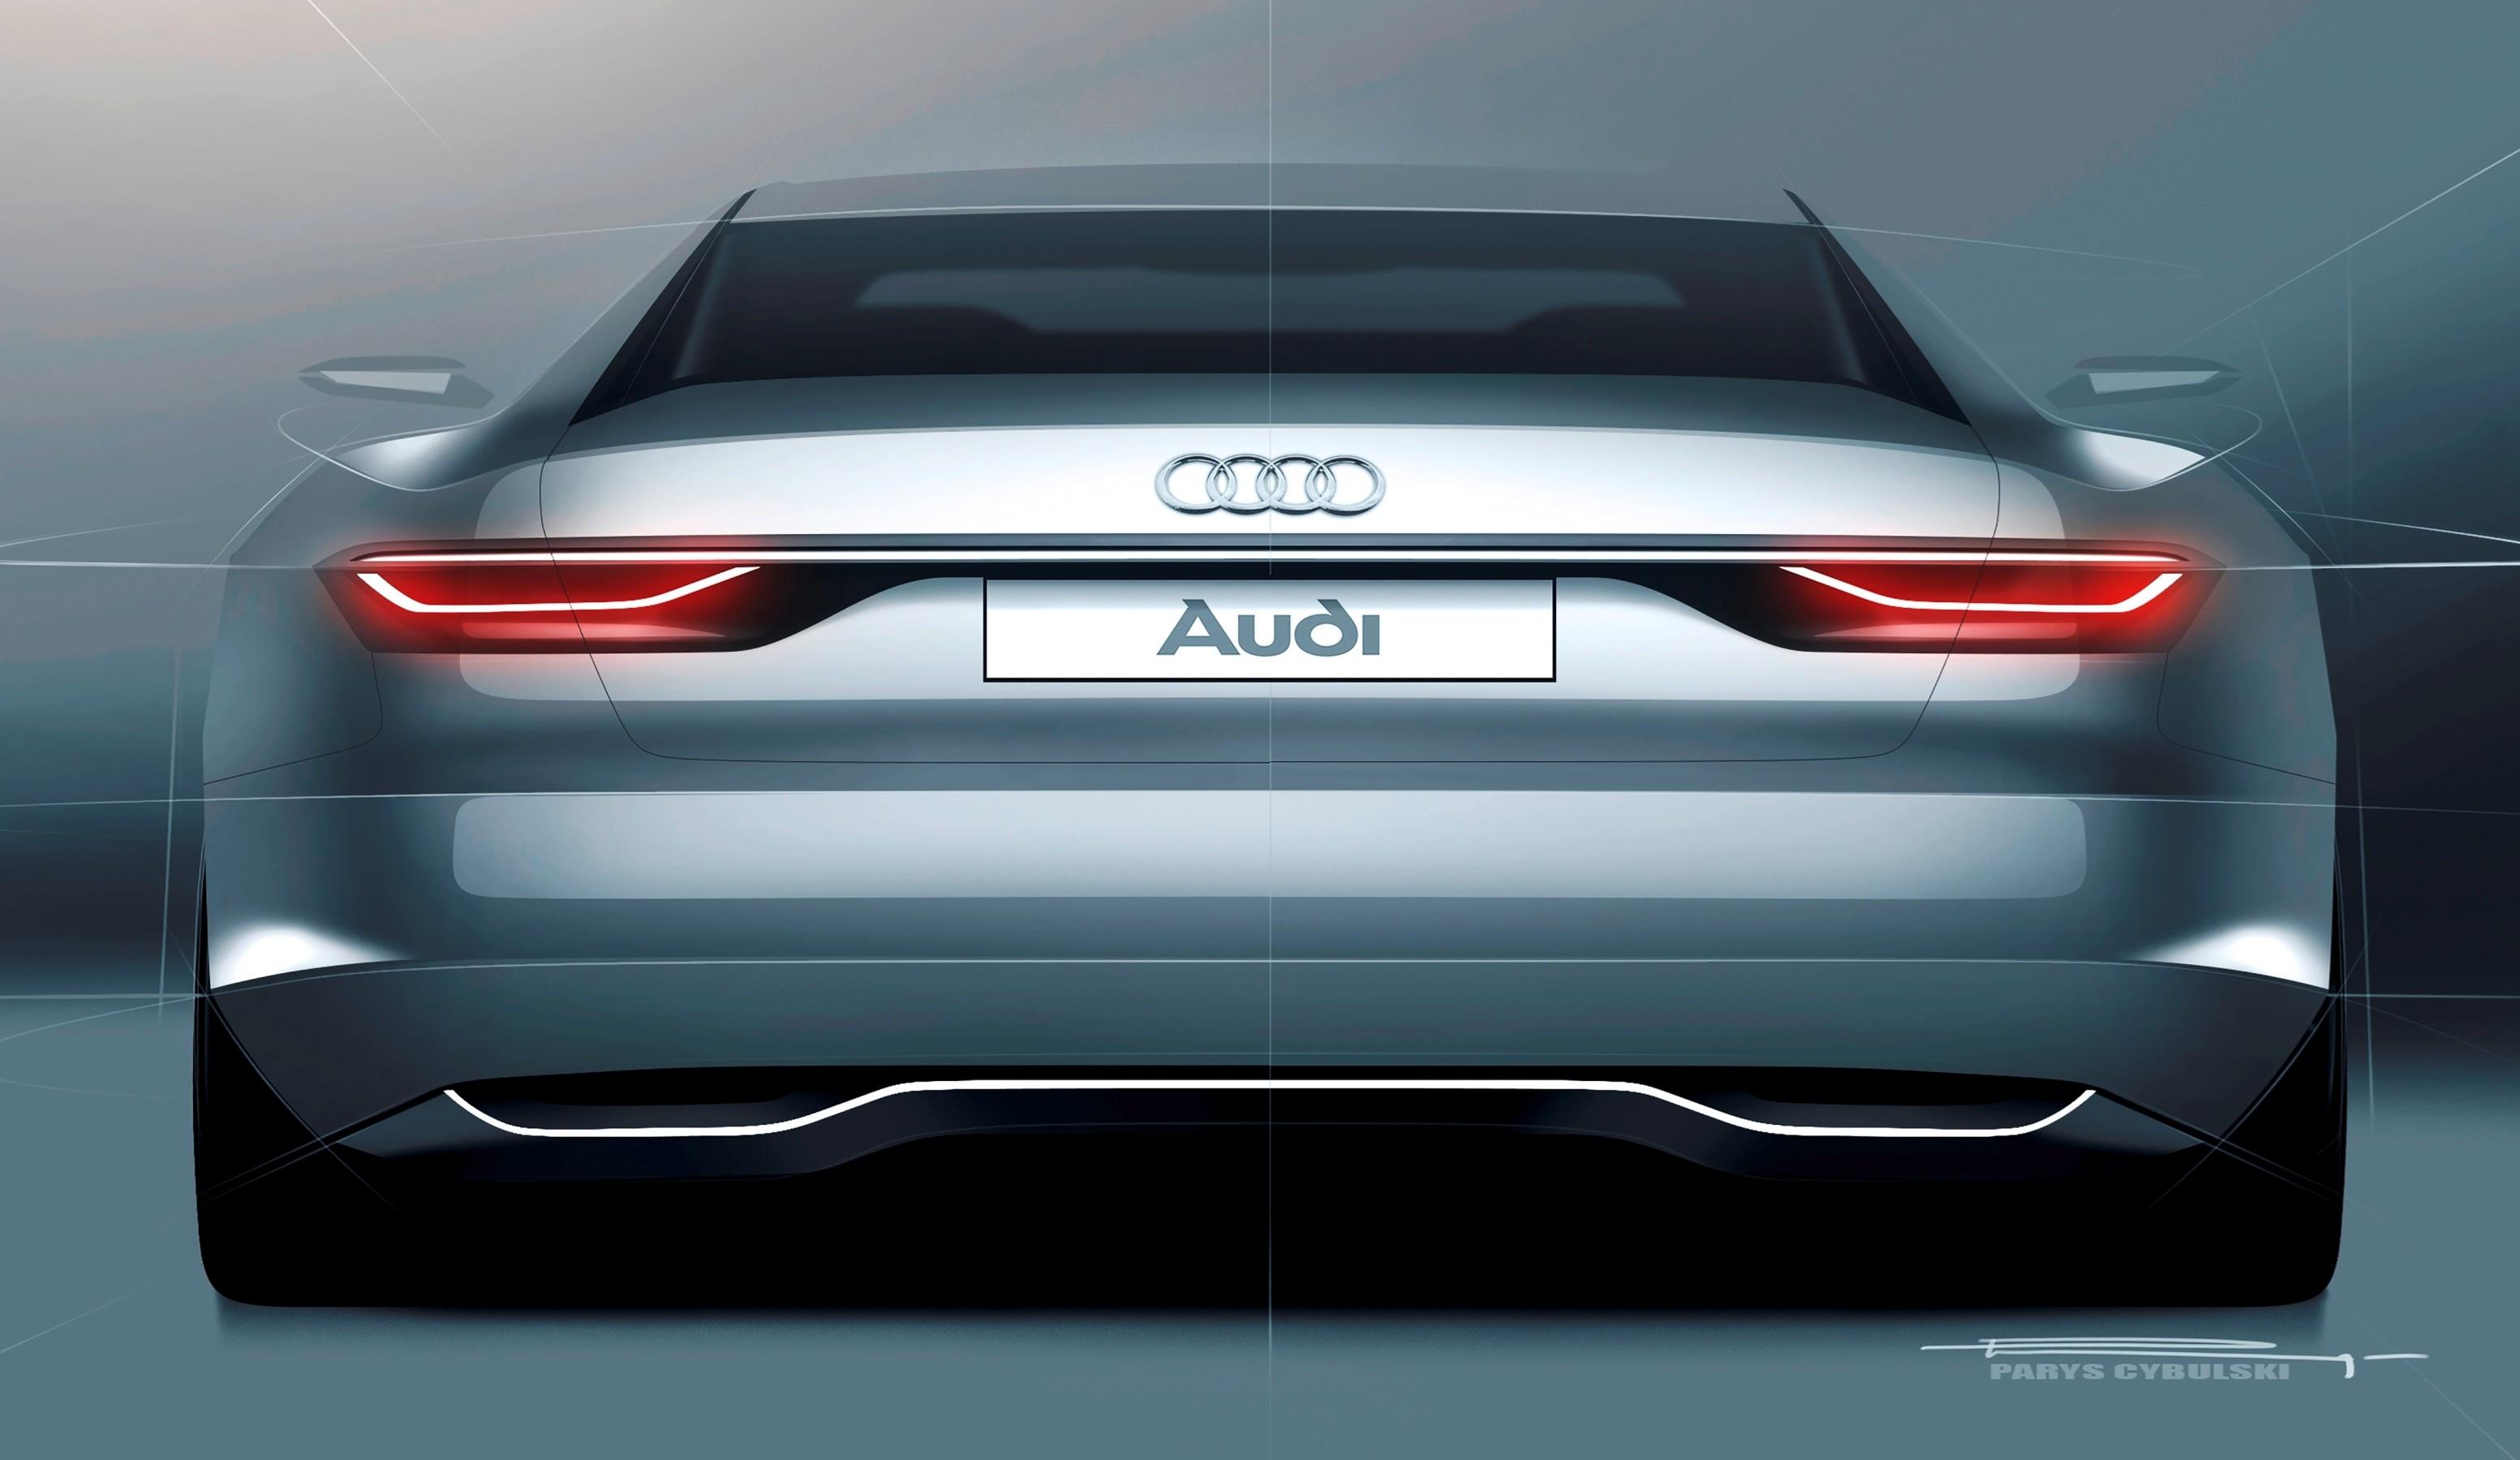 2014 Audi Prologue is Worst of LA 2014 5